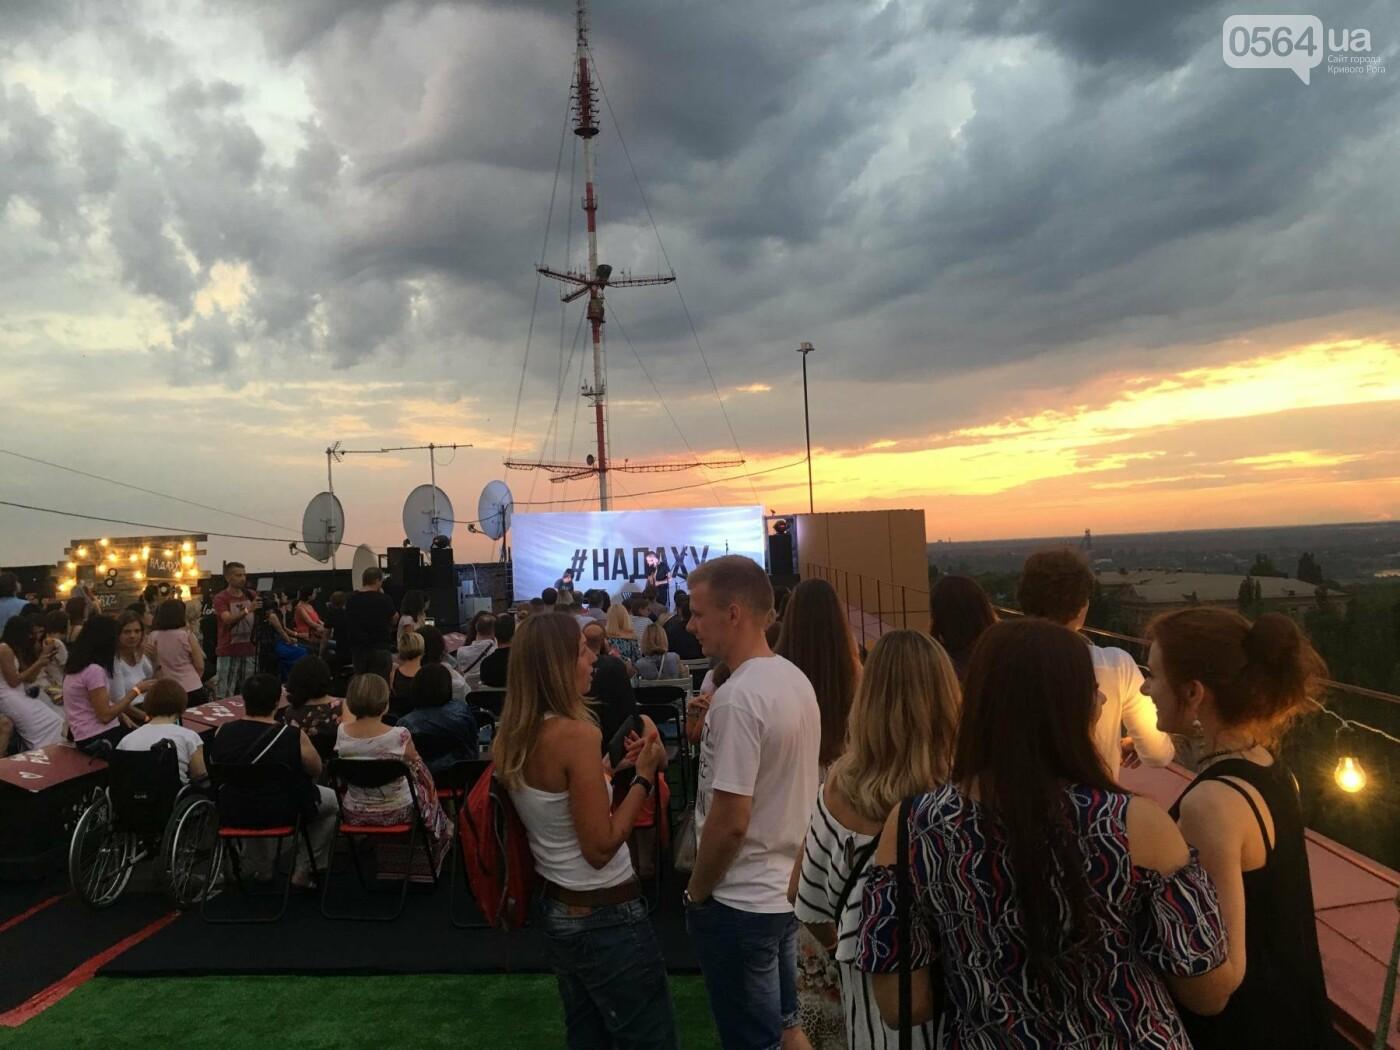 Сотни криворожан встречали закат на крыше отеля под мелодии джаза, - ФОТО, ВИДЕО, фото-43